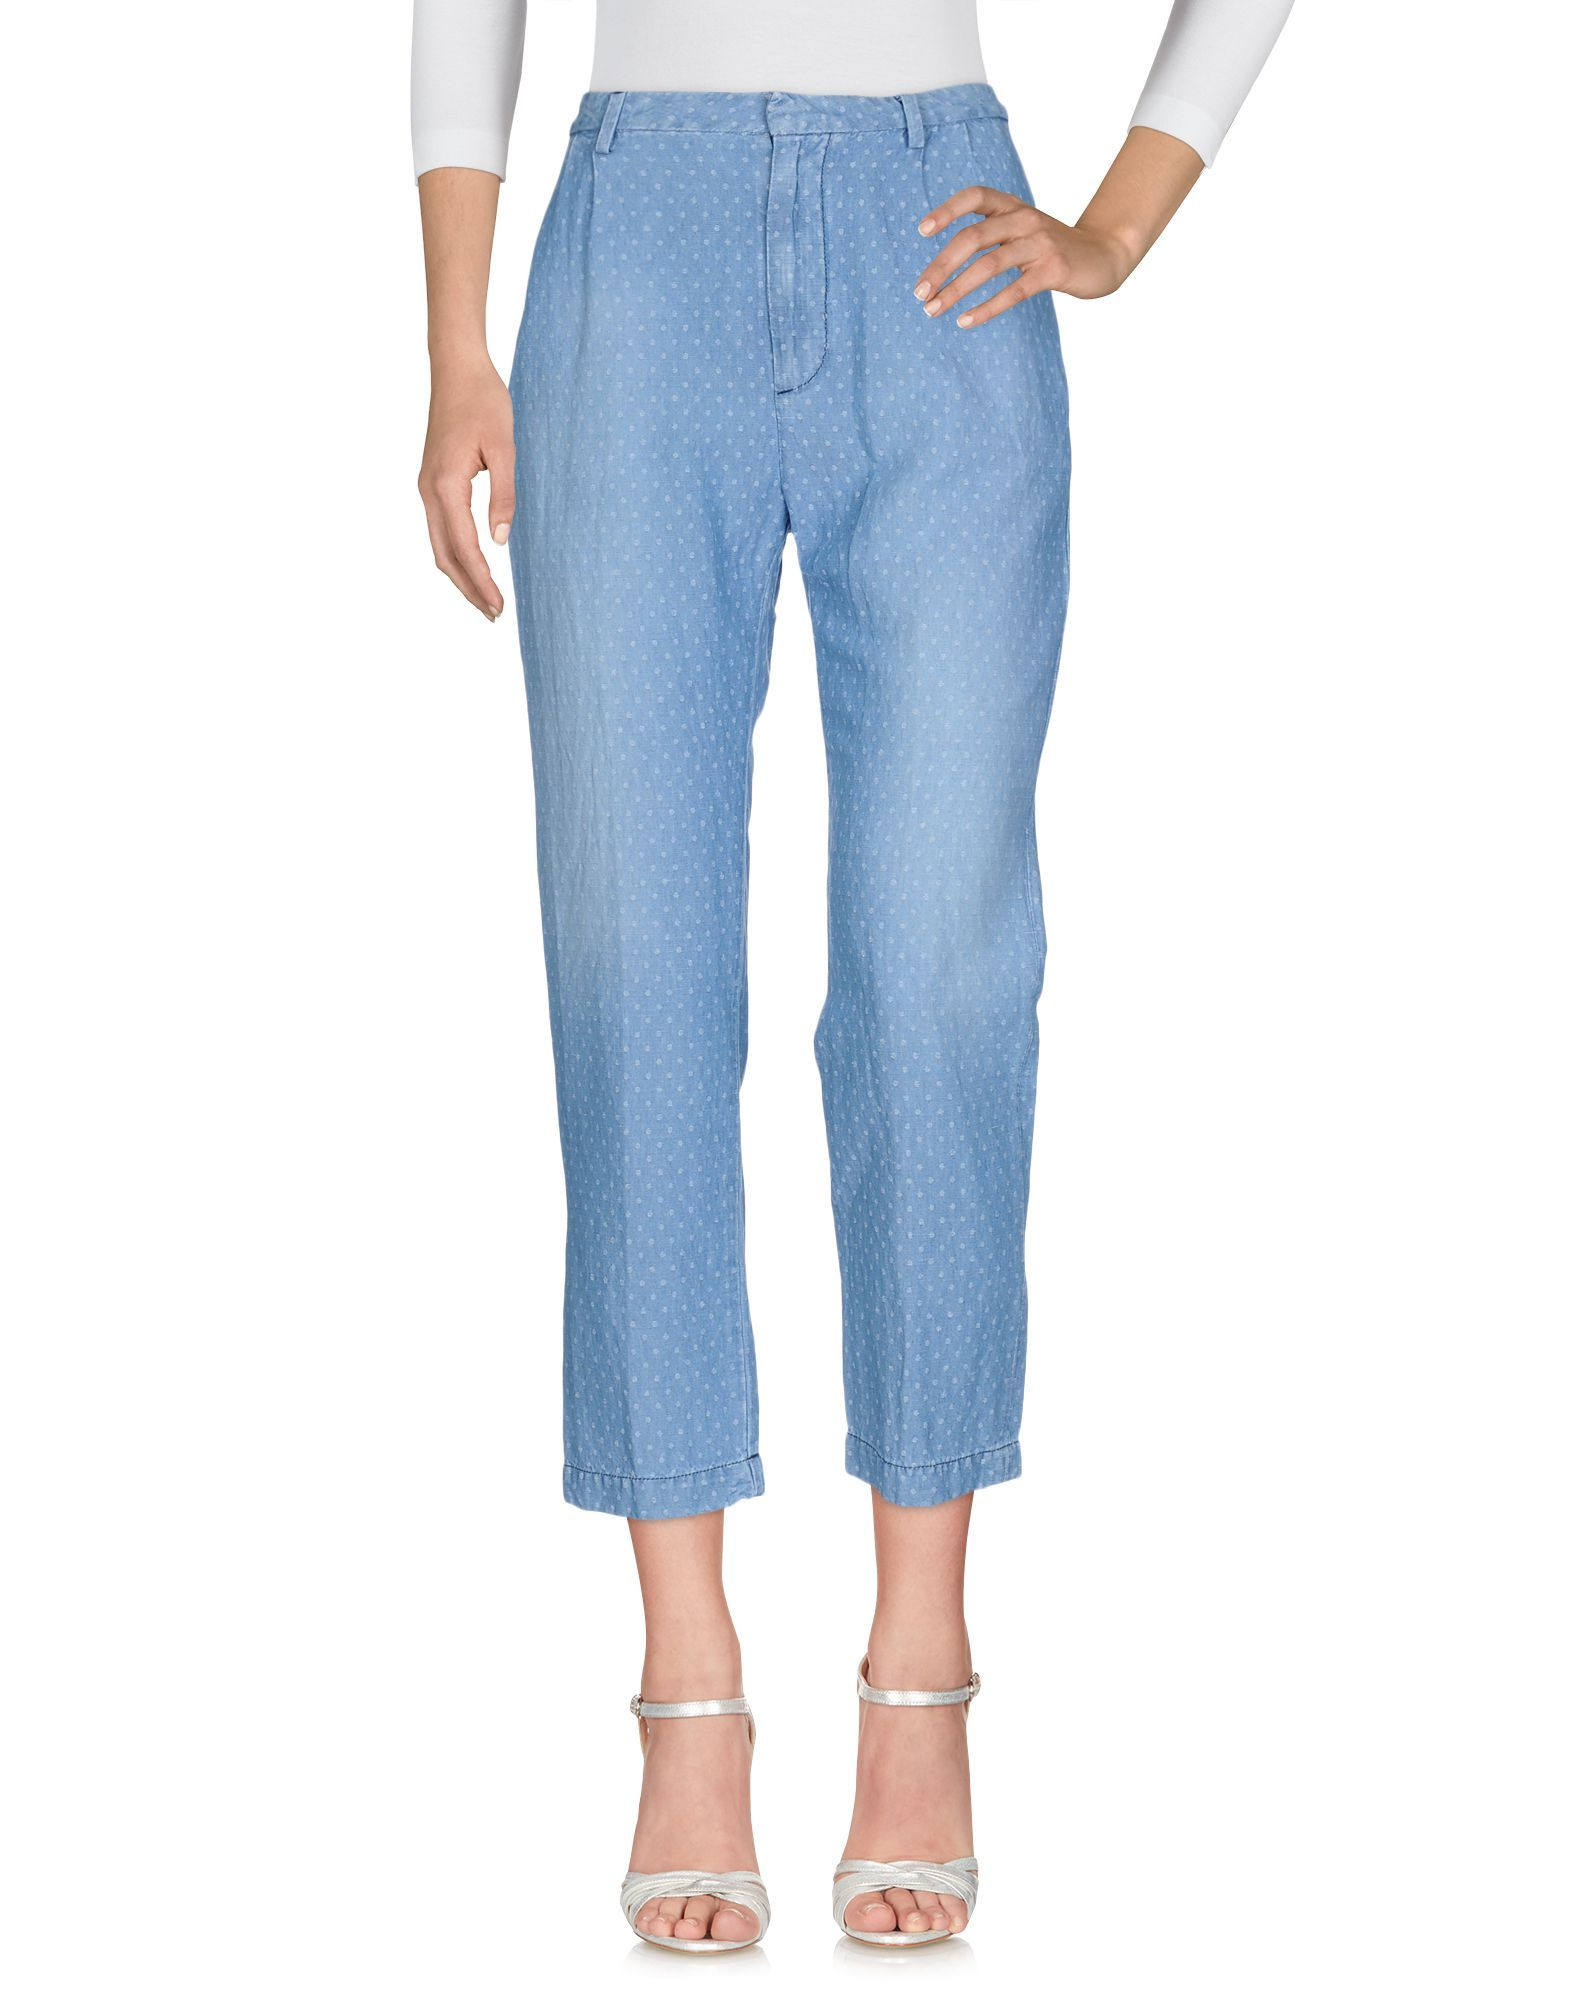 Cycle Blue Linen High Waisted Polka Dot Jeans